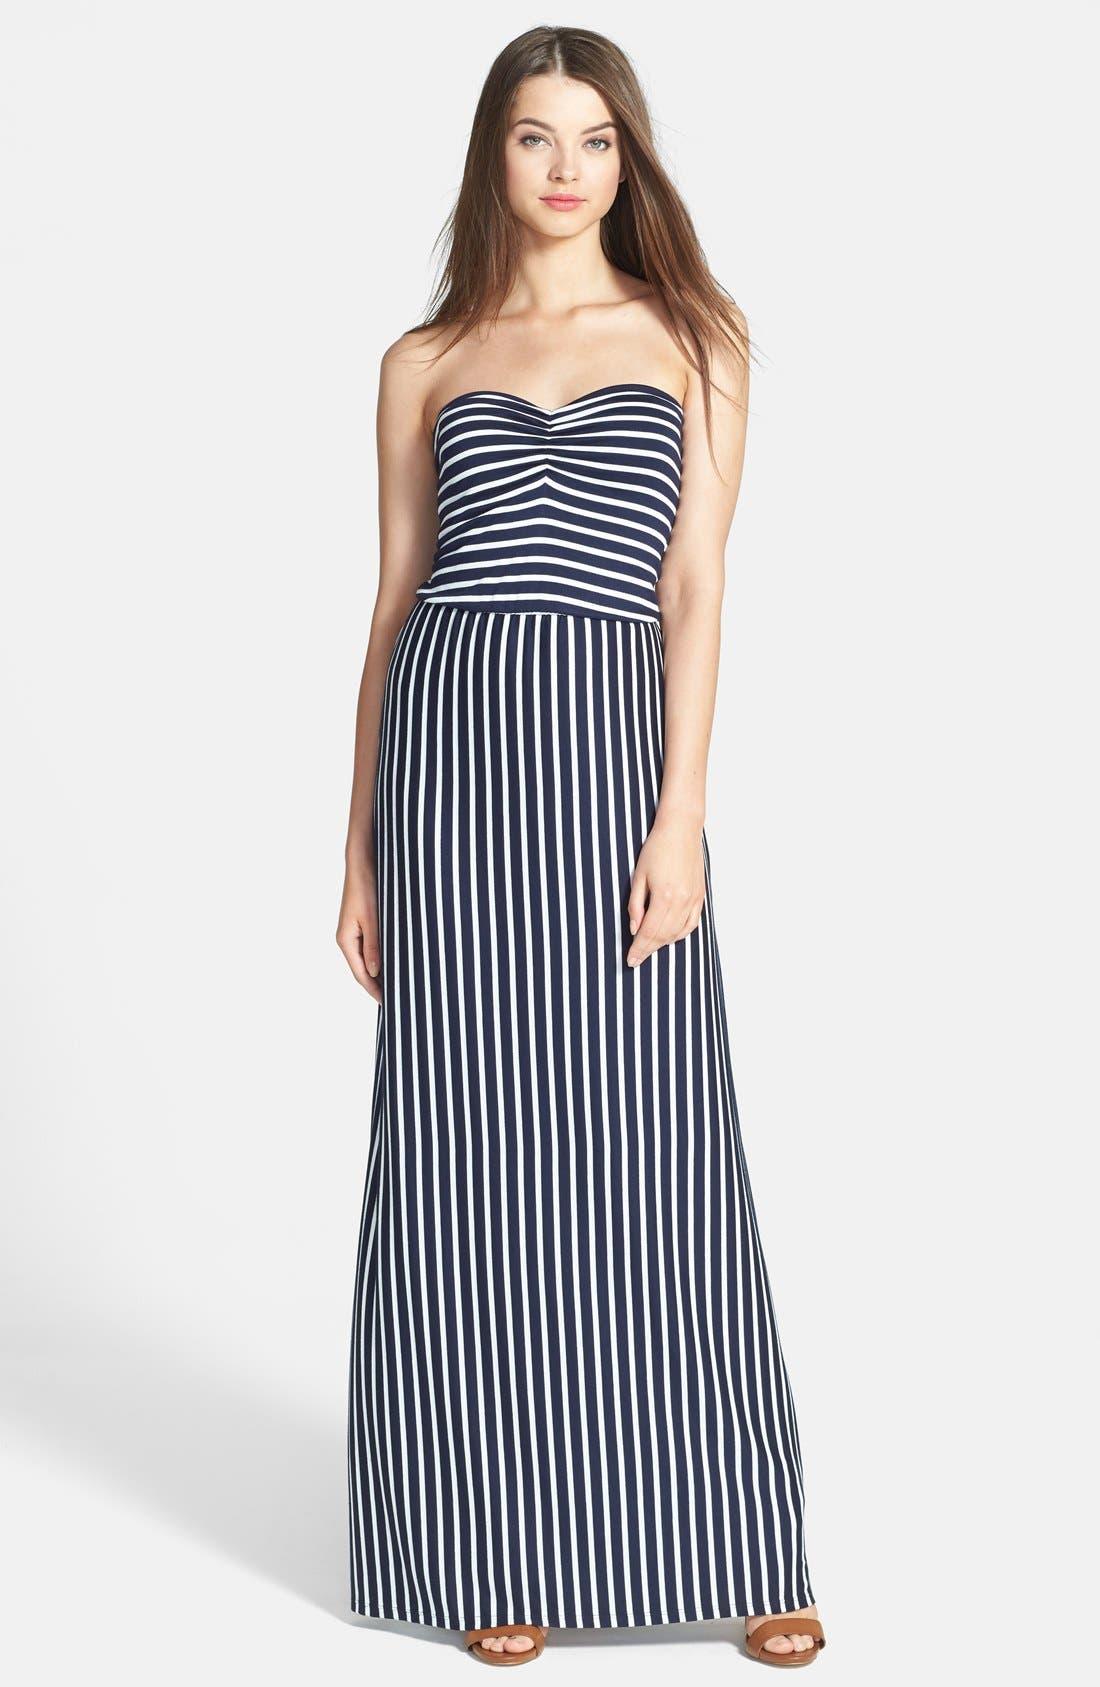 Alternate Image 1 Selected - Loveappella Strapless Twist Back Stripe Maxi Dress (Regular & Petite)